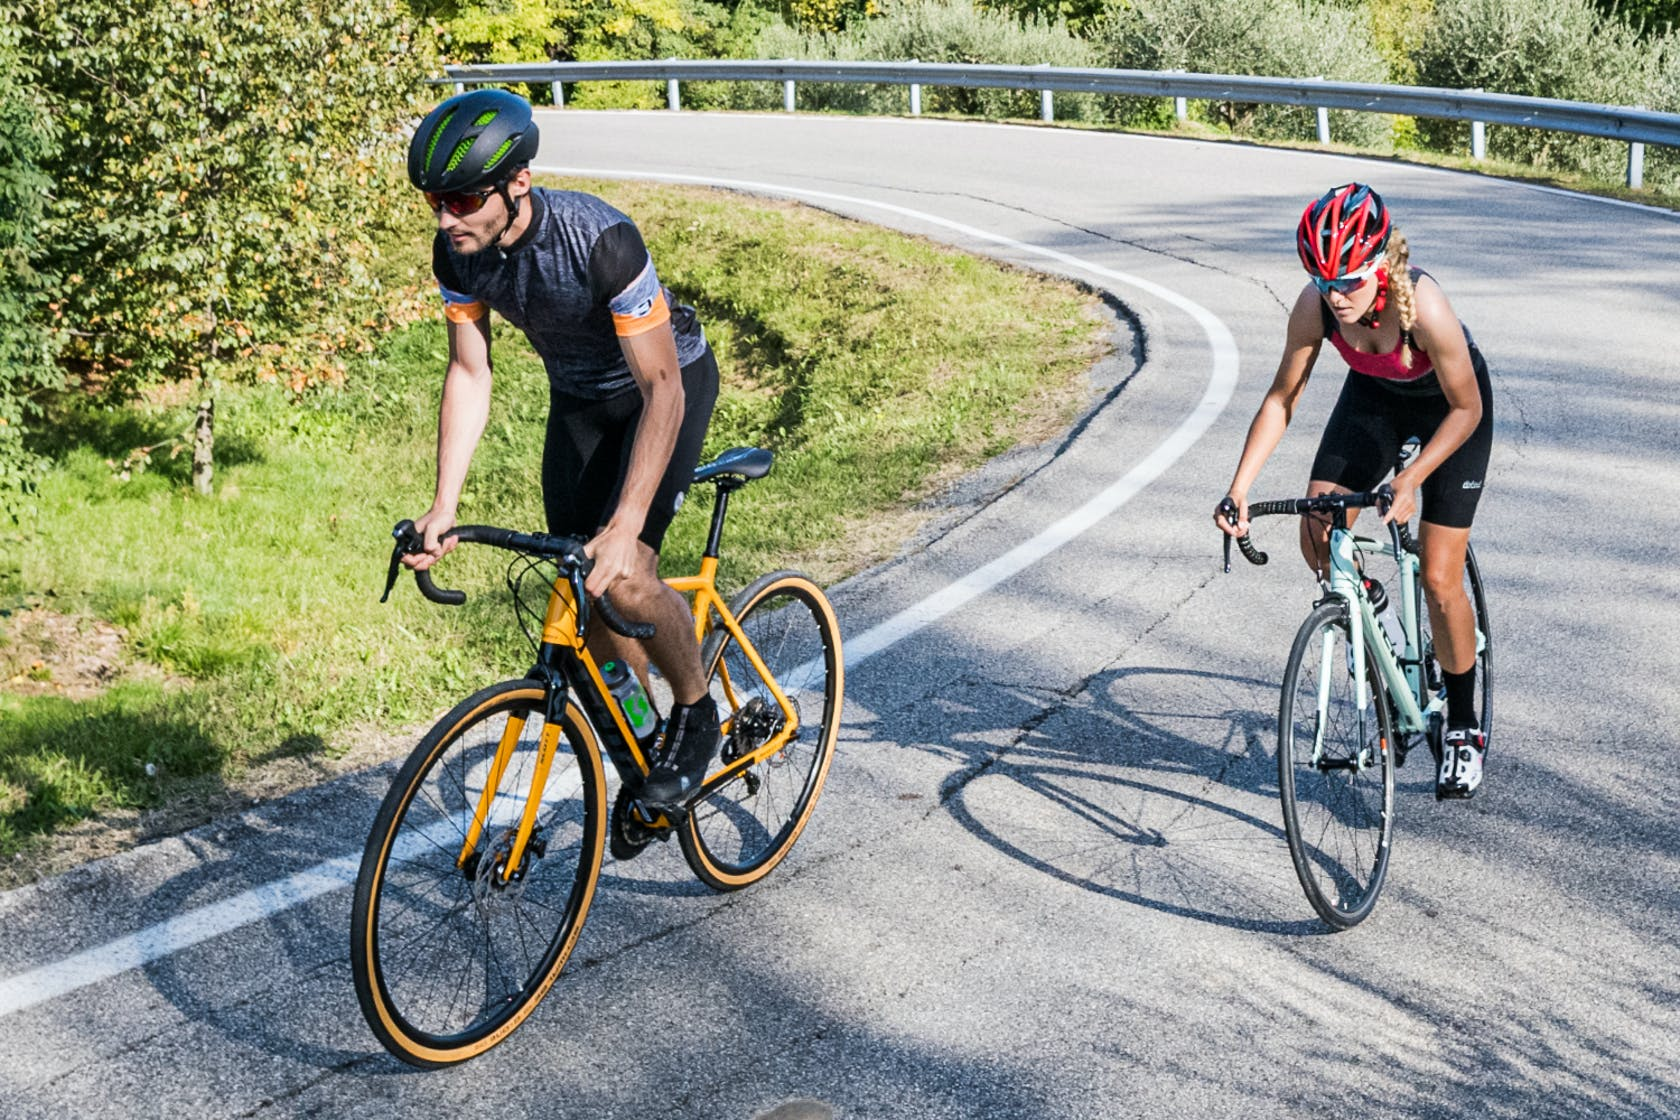 Bike | Onlineshop Bekleidung Ausruestung Schuhe